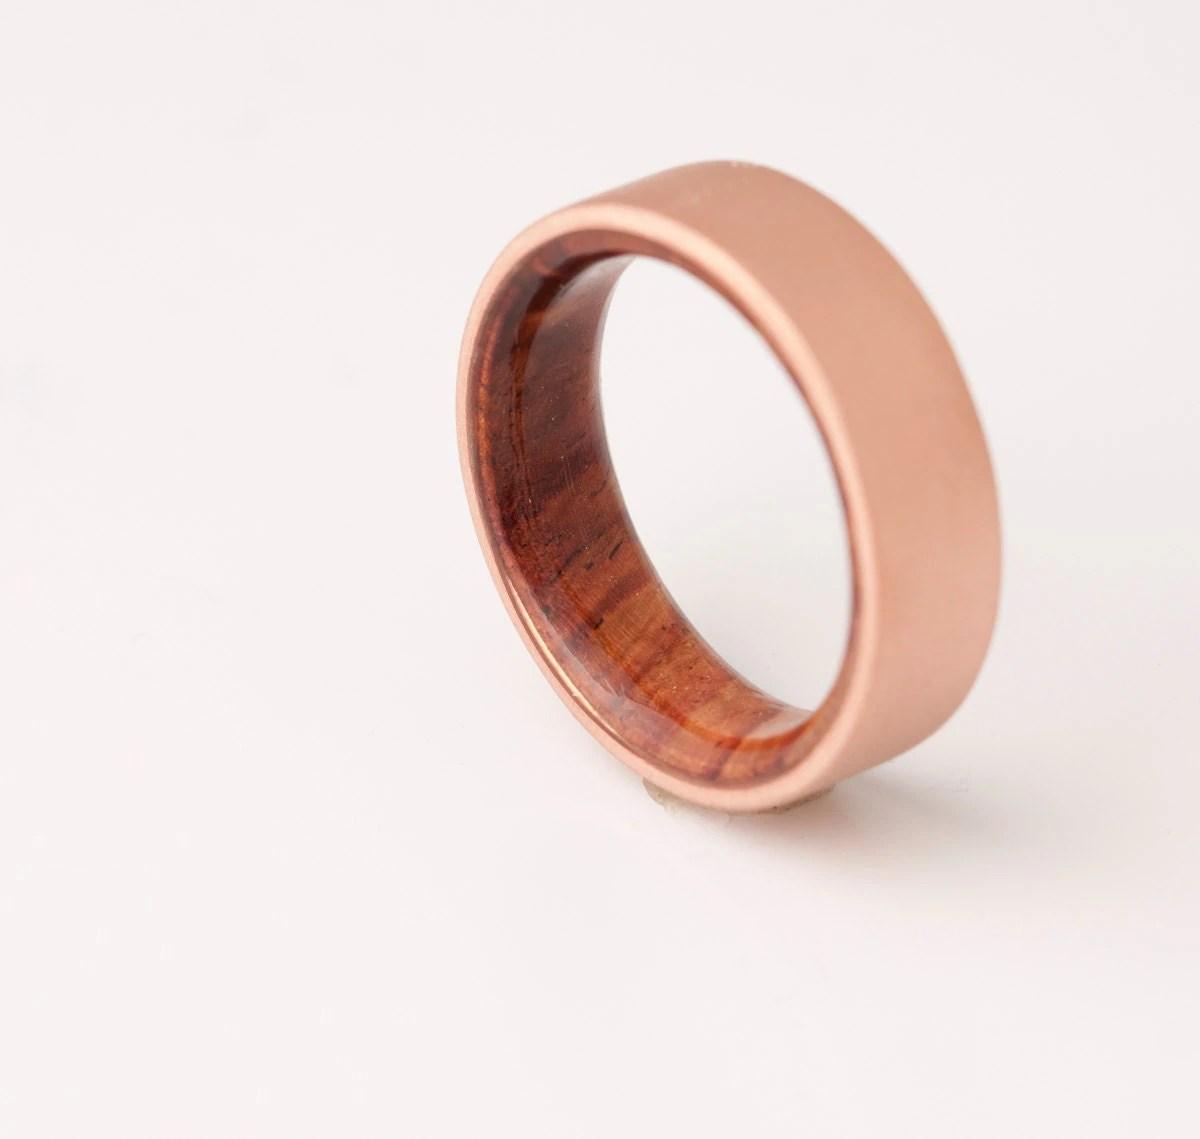 mens wedding ring man wedding ring Copper Wedding Band Copper Wood Ring Cocobolo Ring Man Ring mens wood wedding band